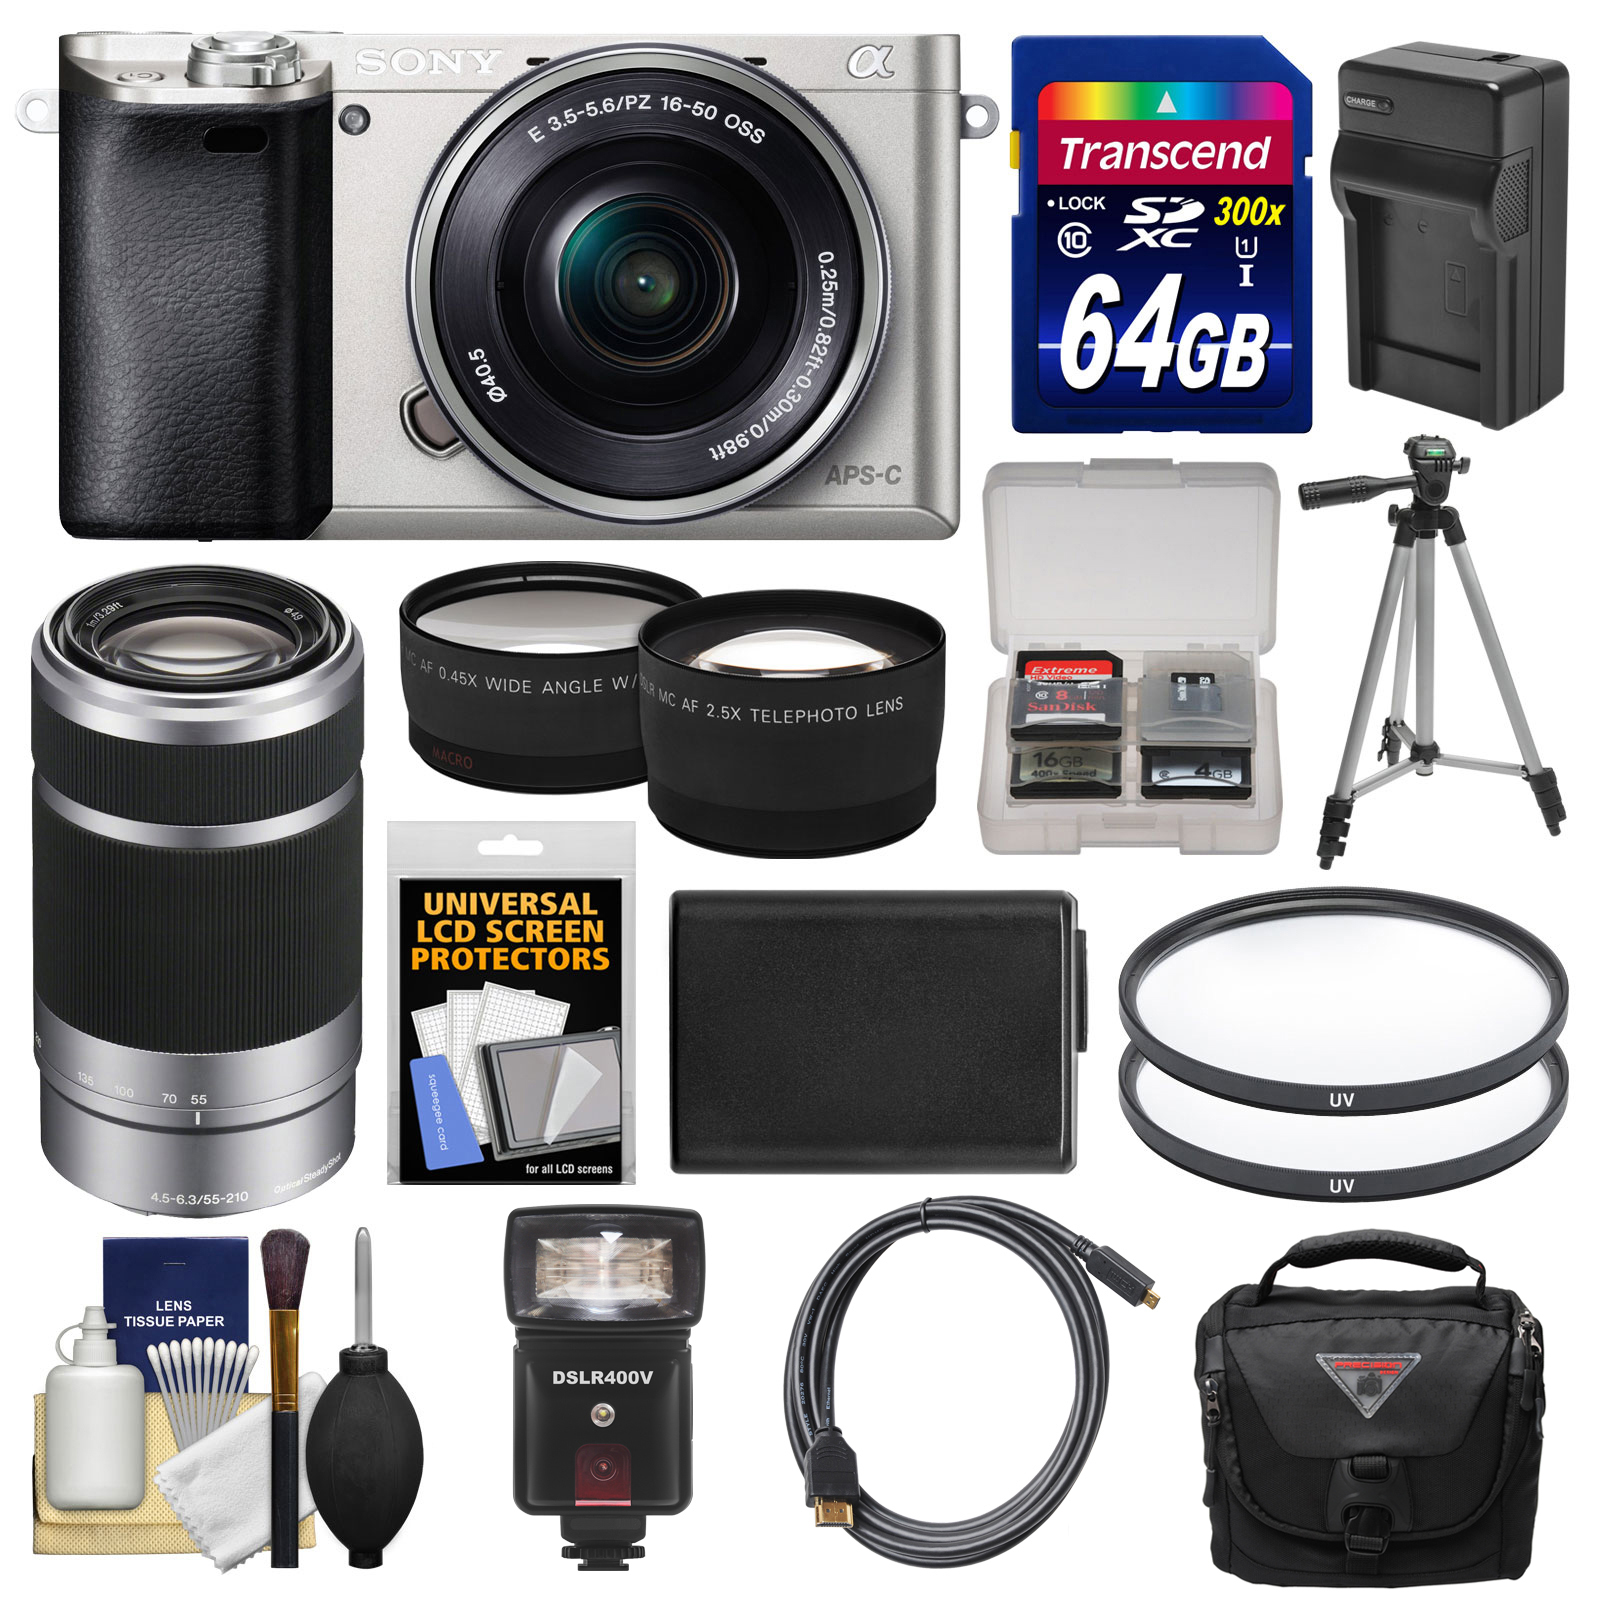 Sony Alpha A6000 Wi-Fi Digital Camera & 16-50mm Lens (Silver) with 55-210mm Lens + 64GB... by Sony